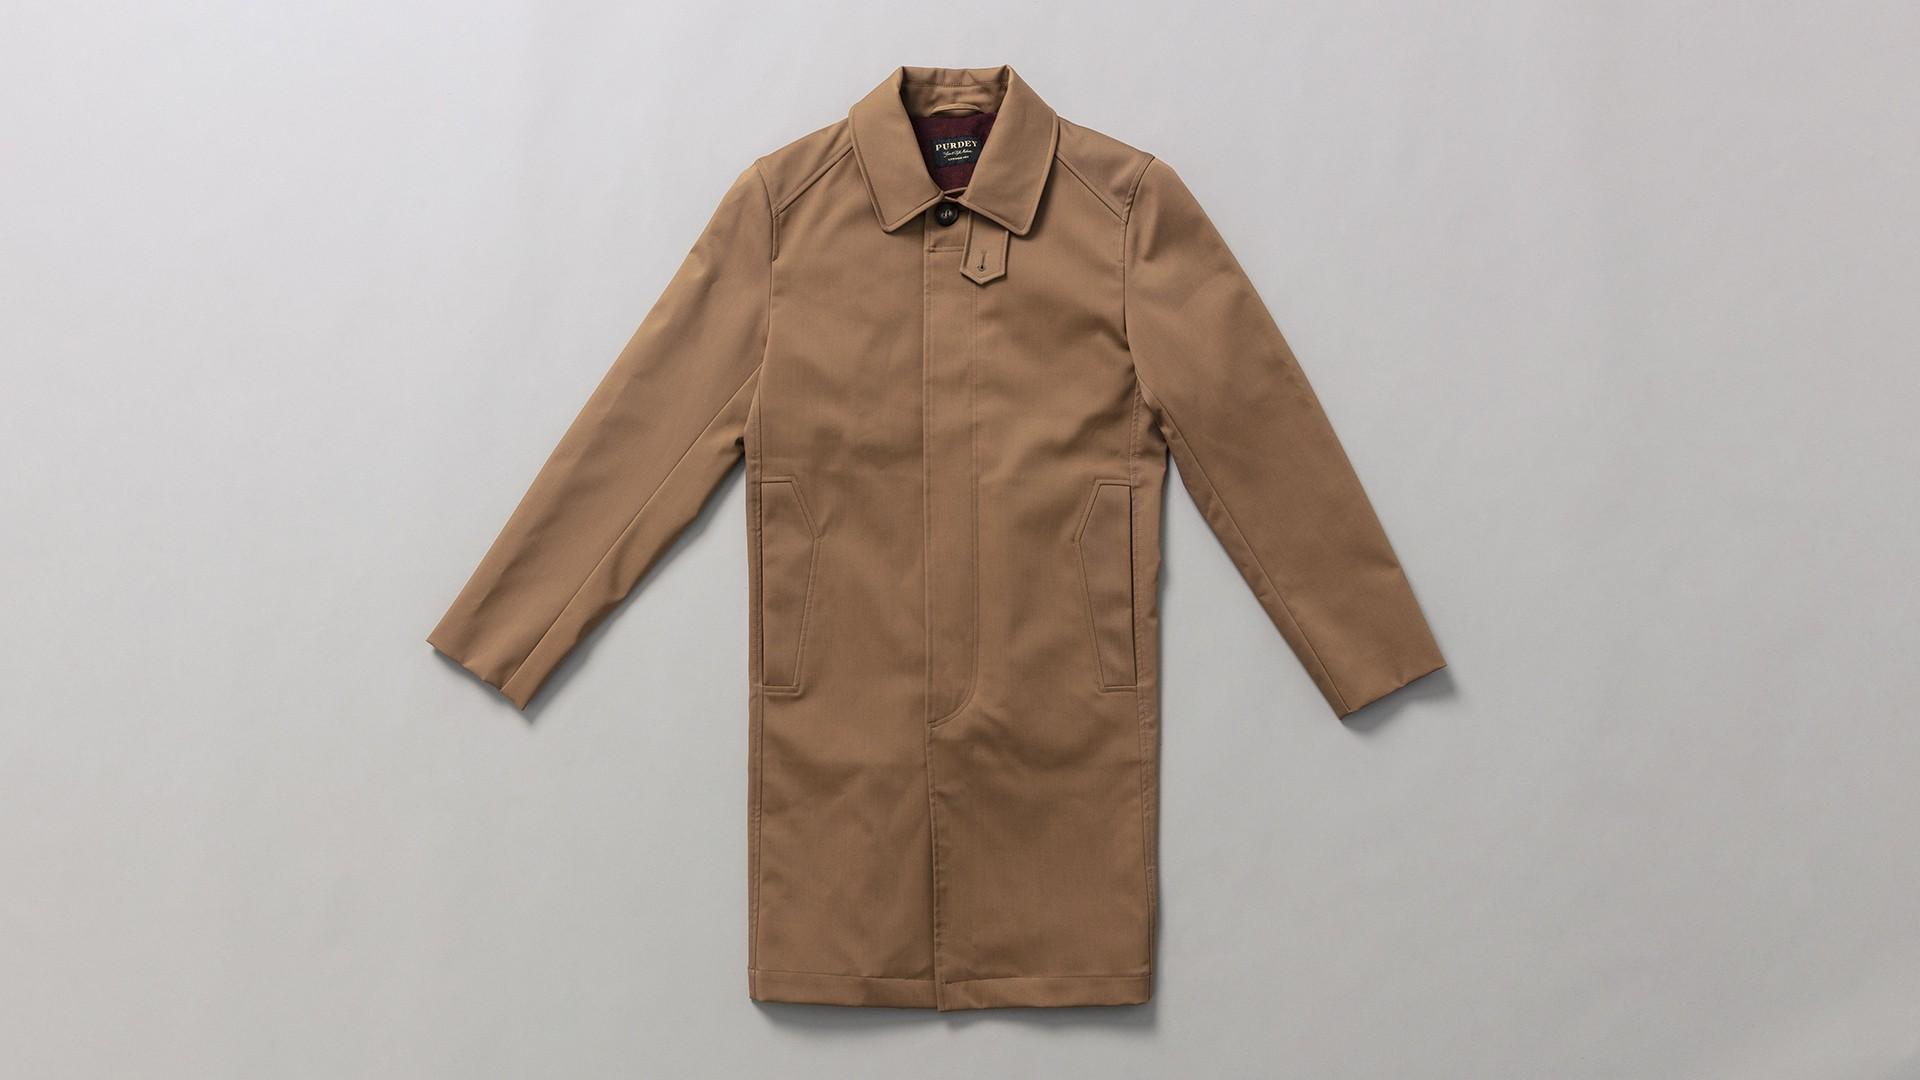 Purdey Men's Mayfair raincoat